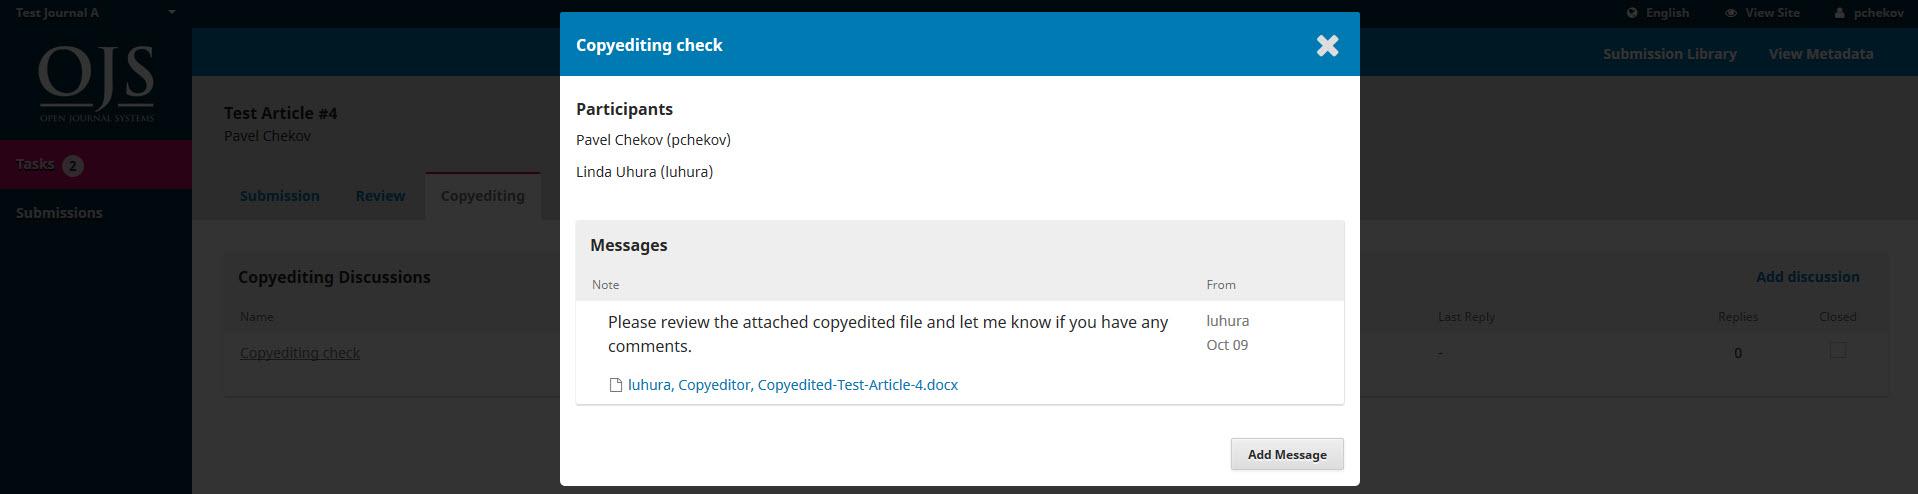 ojs3-author-copyedits-message